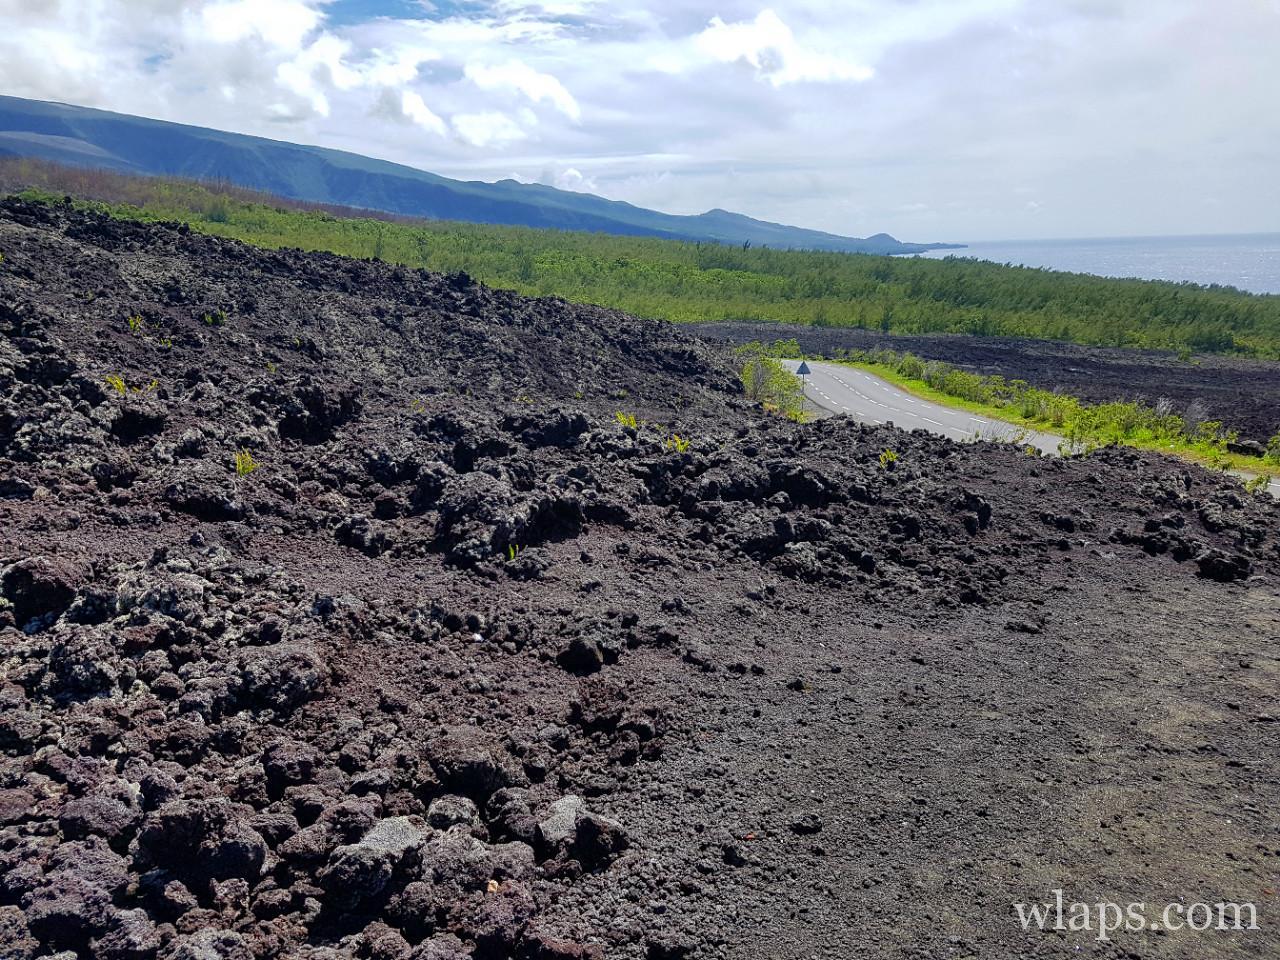 Grand Brulé à l'ile de La Réunion